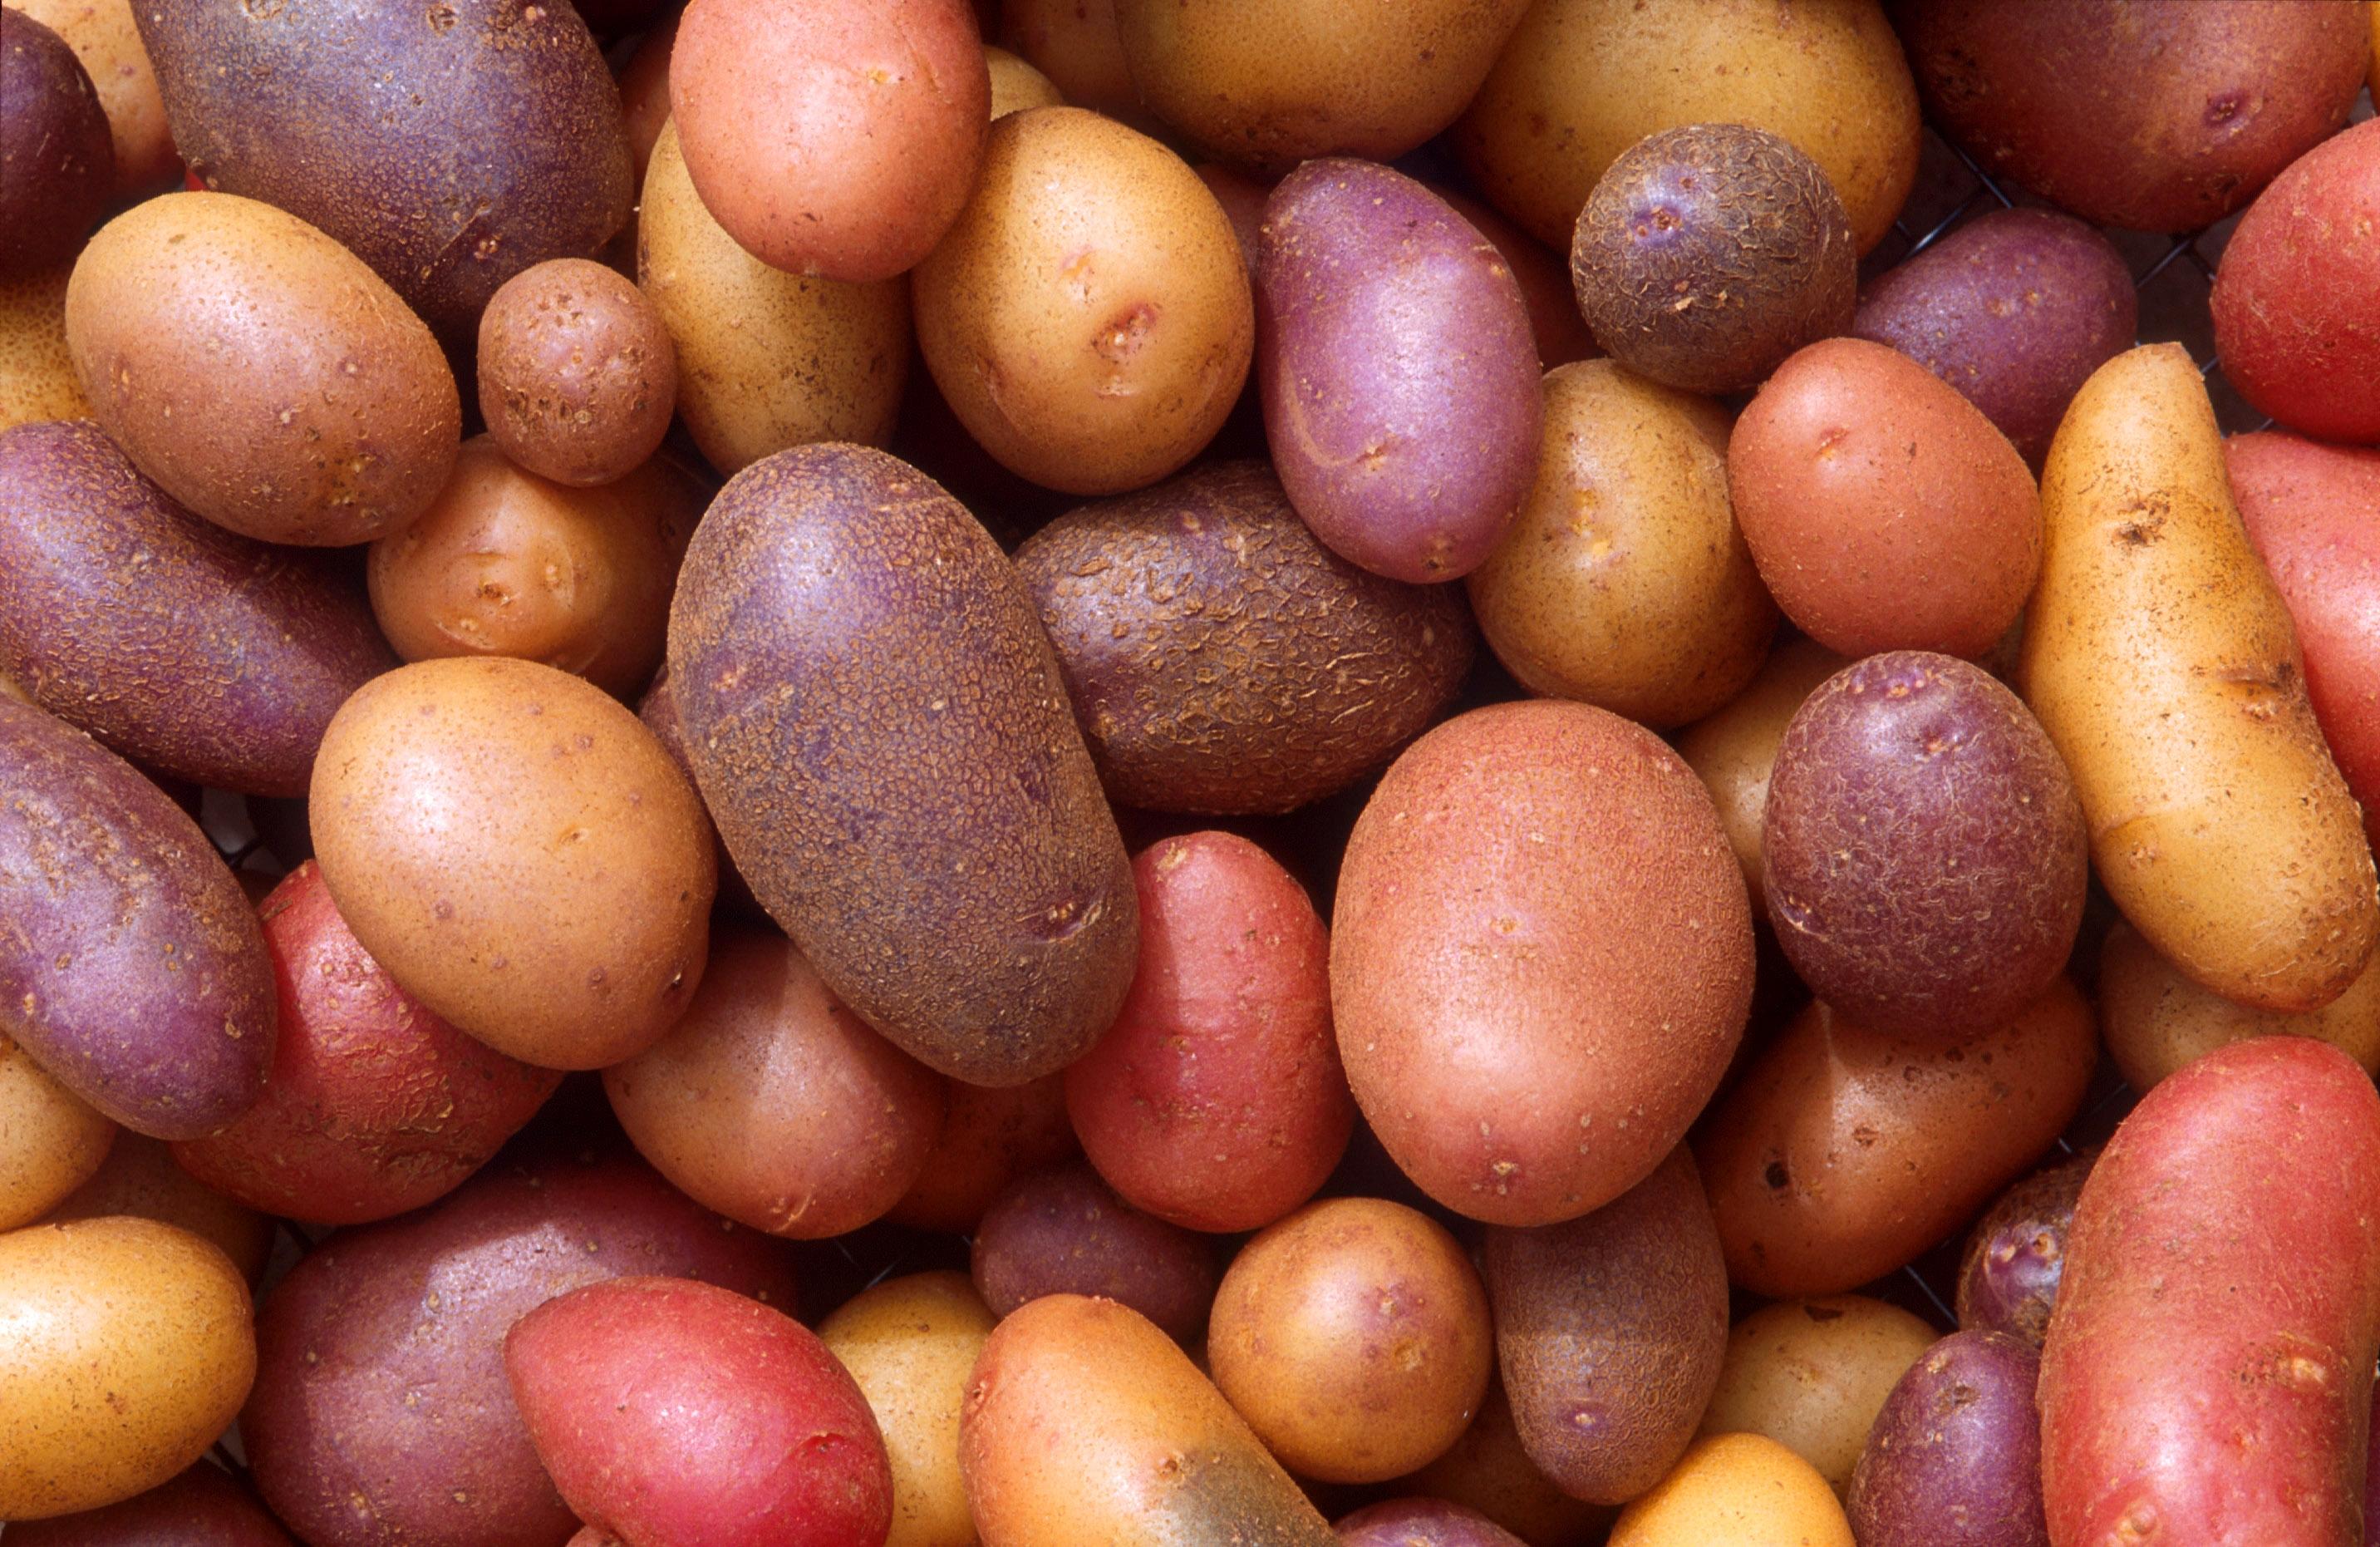 Drawn potato Potato Potato Gardener Blogs primer